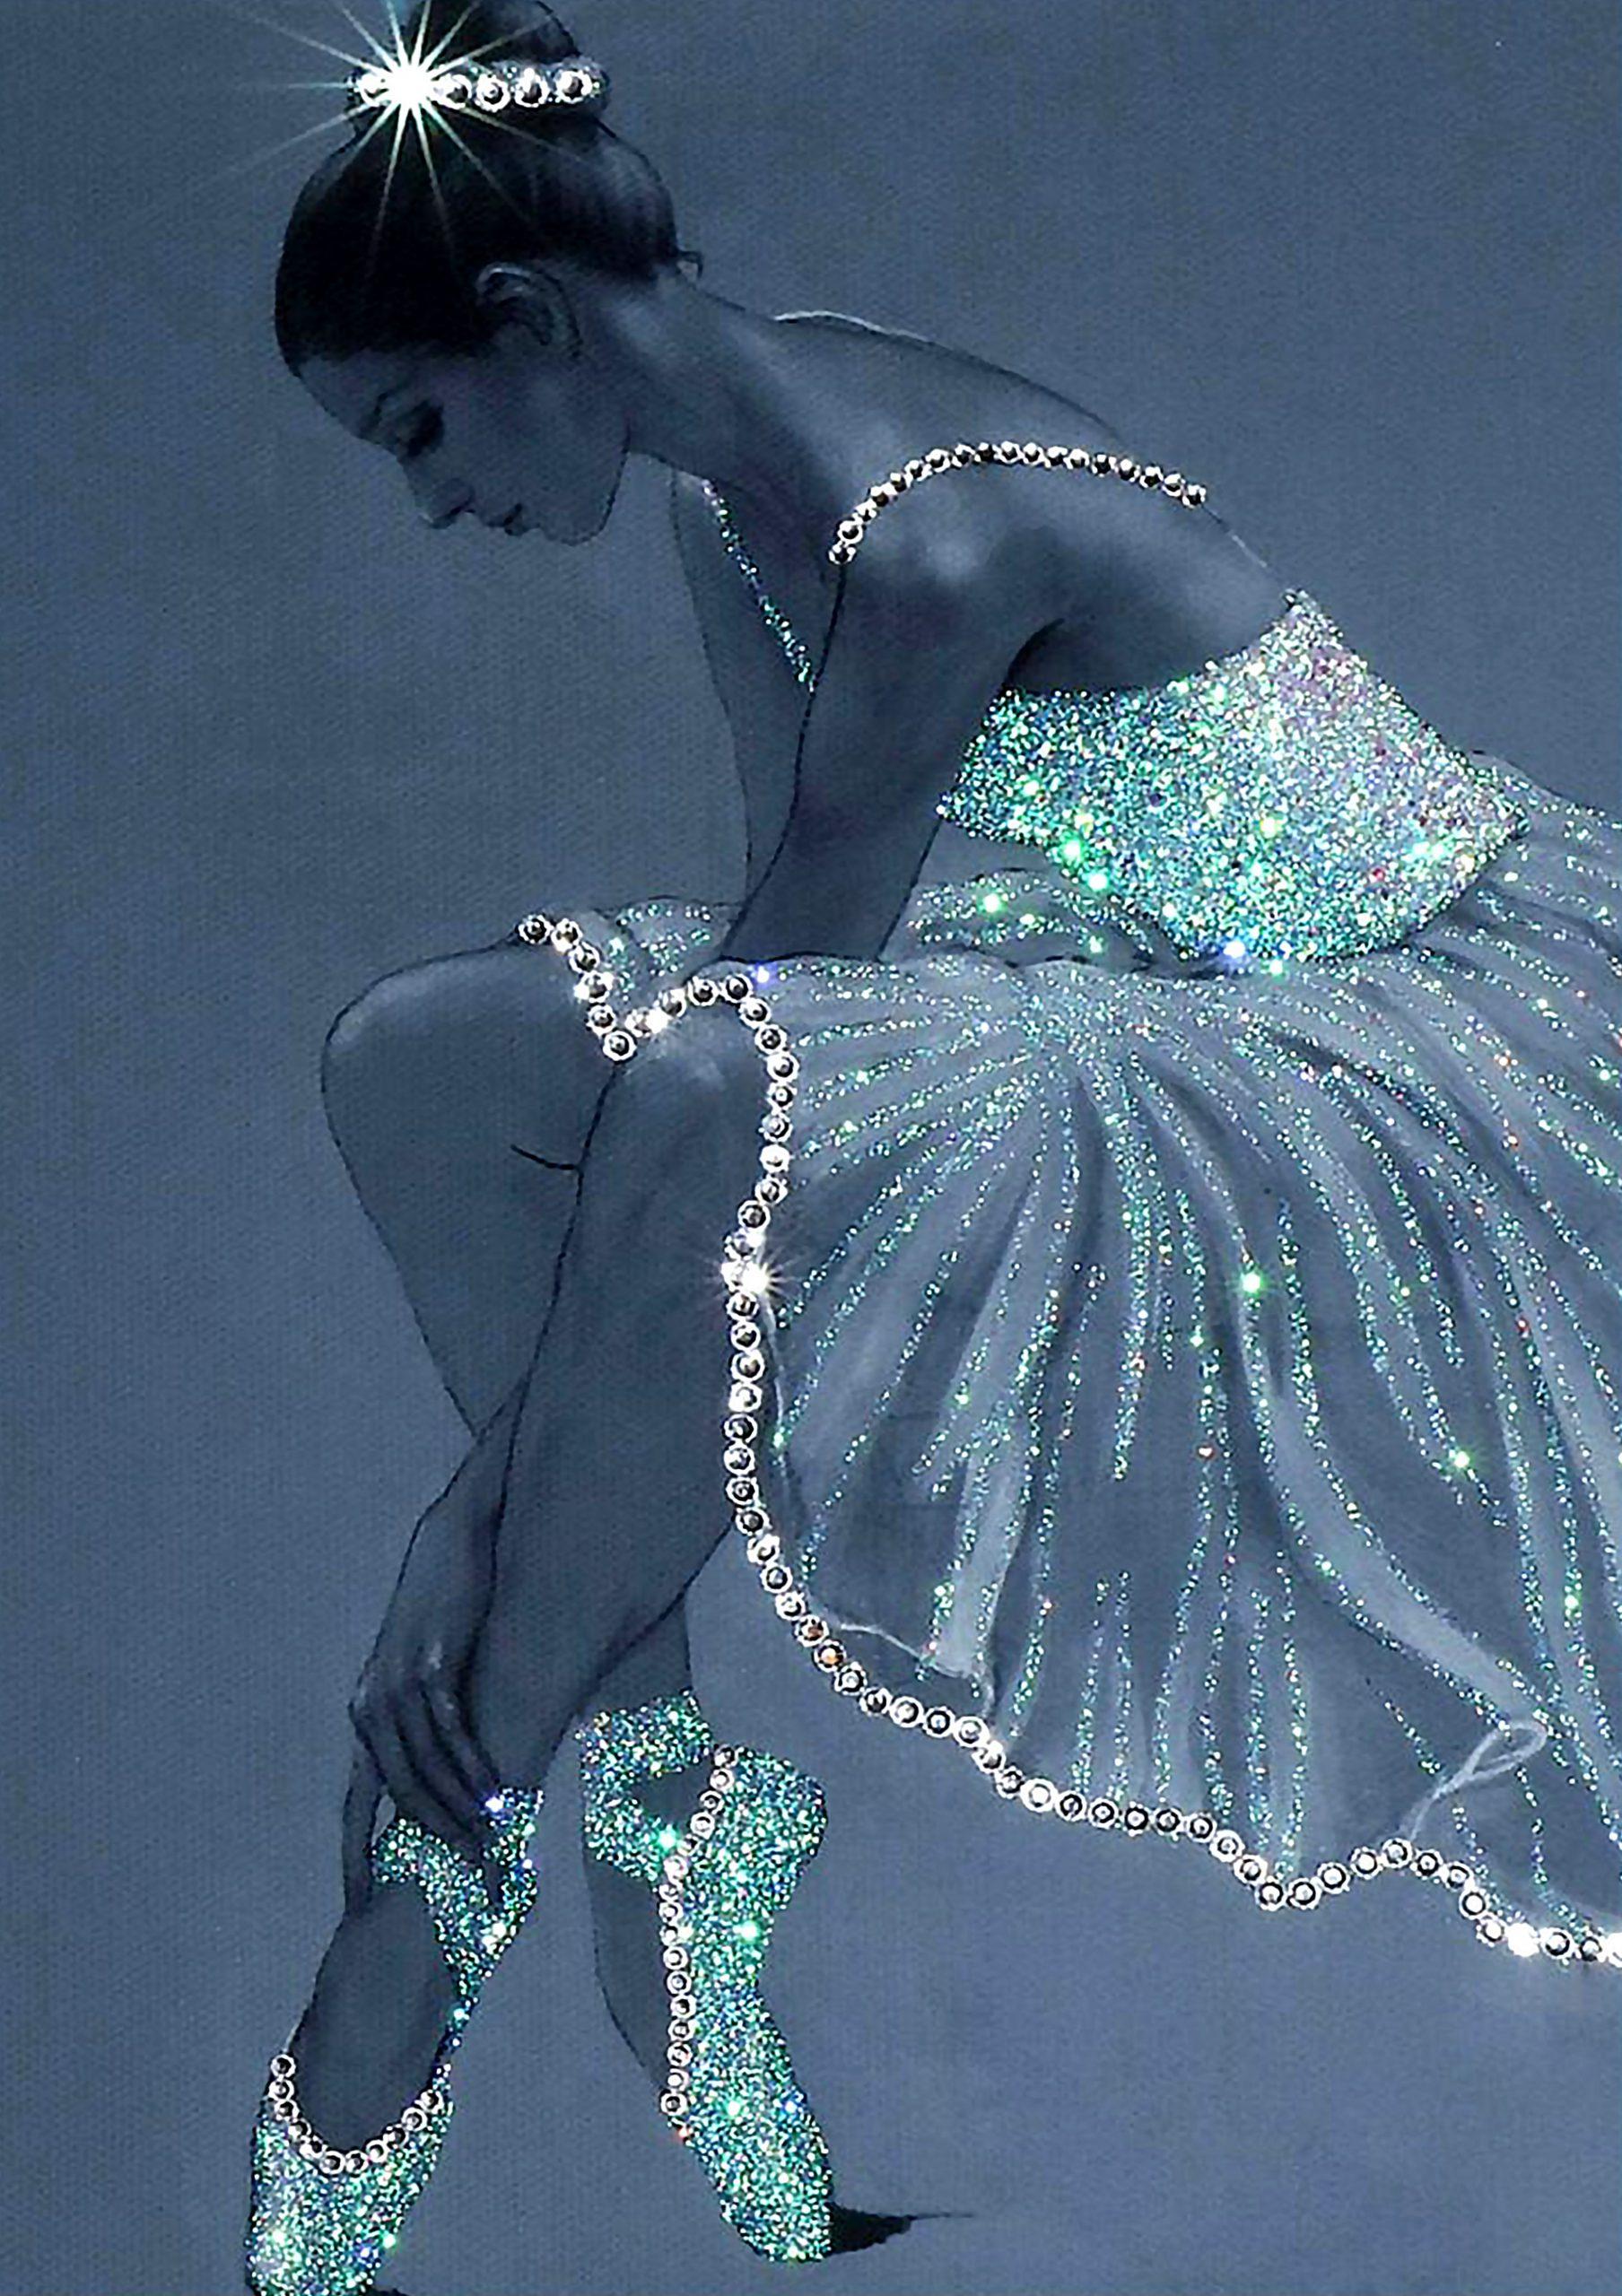 ballet girl love ballet poster 1 - Copy (2)